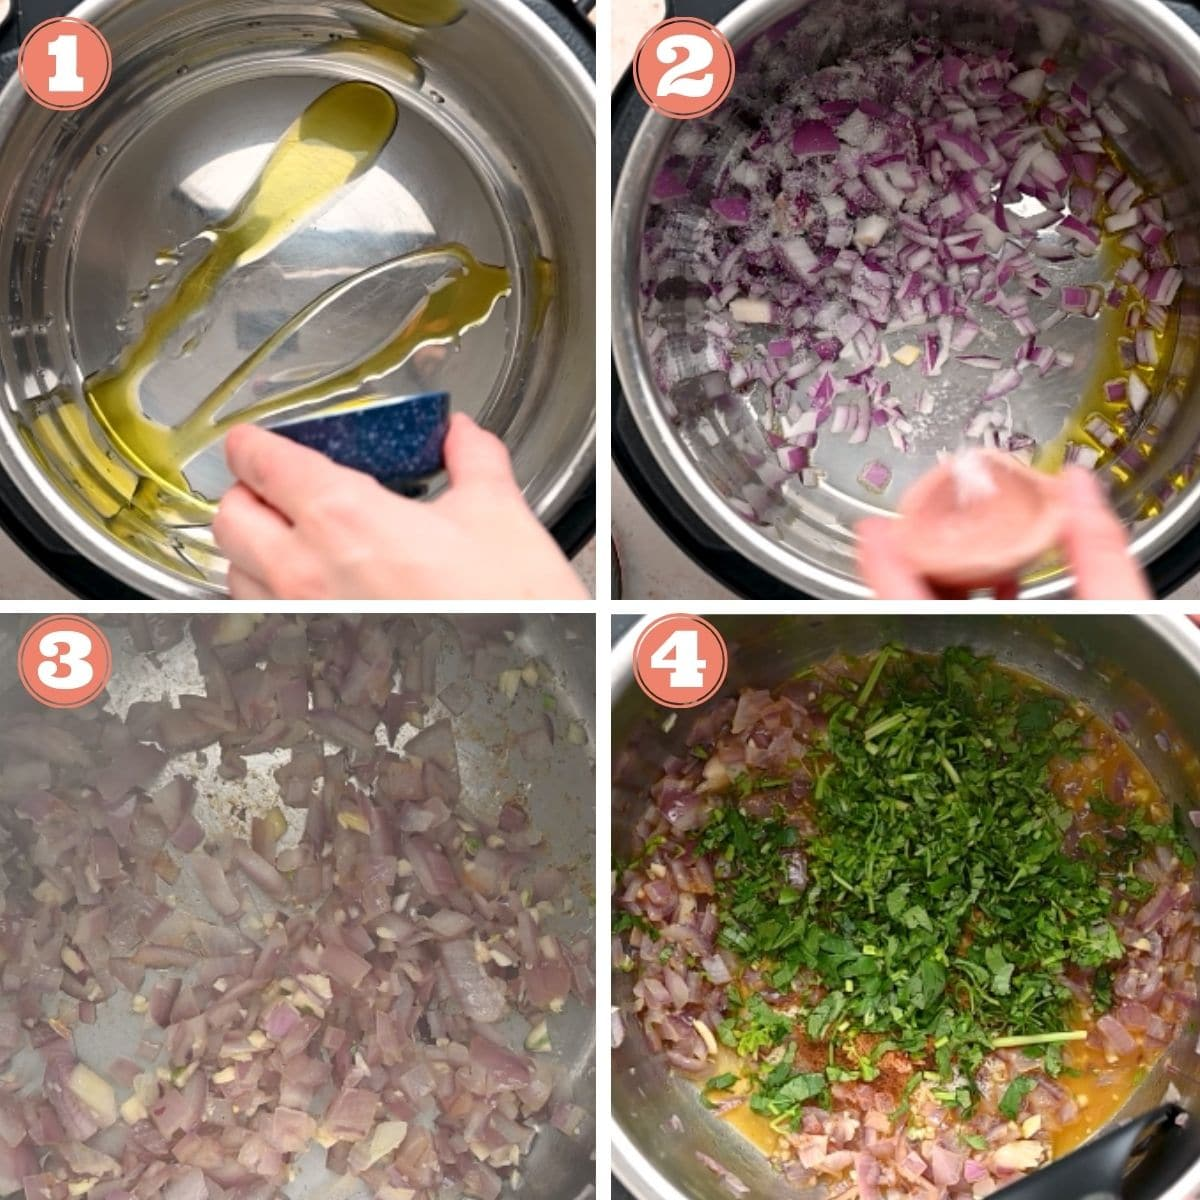 Steps 1 through 4 to make instant pot black beans